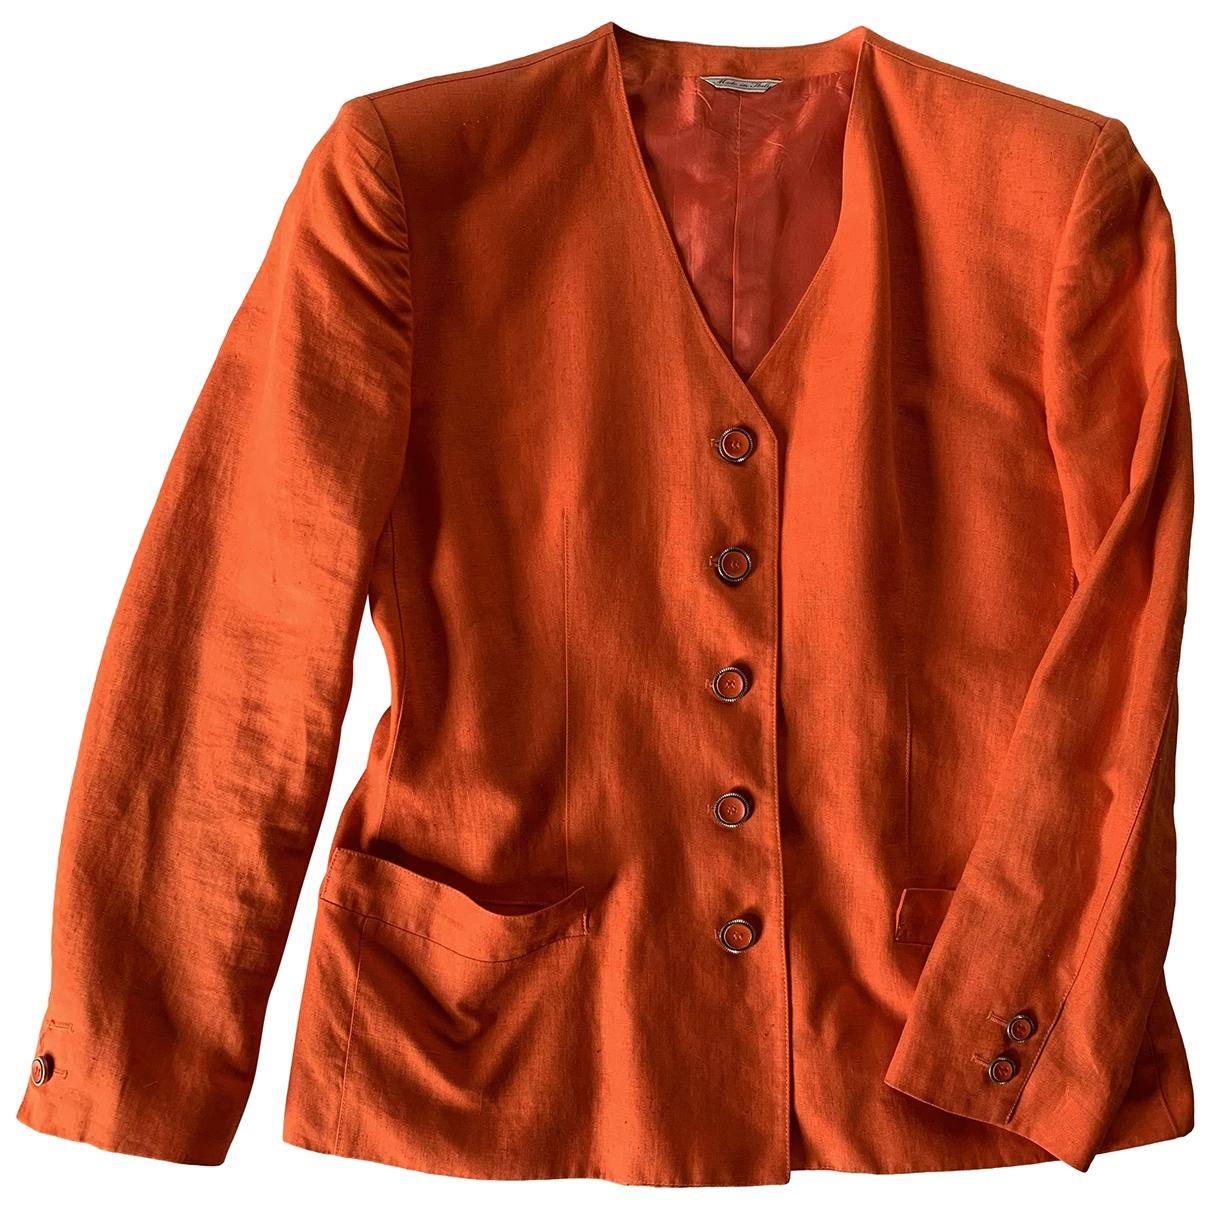 Gianni Versace \N Orange Linen jacket for Women 44 IT